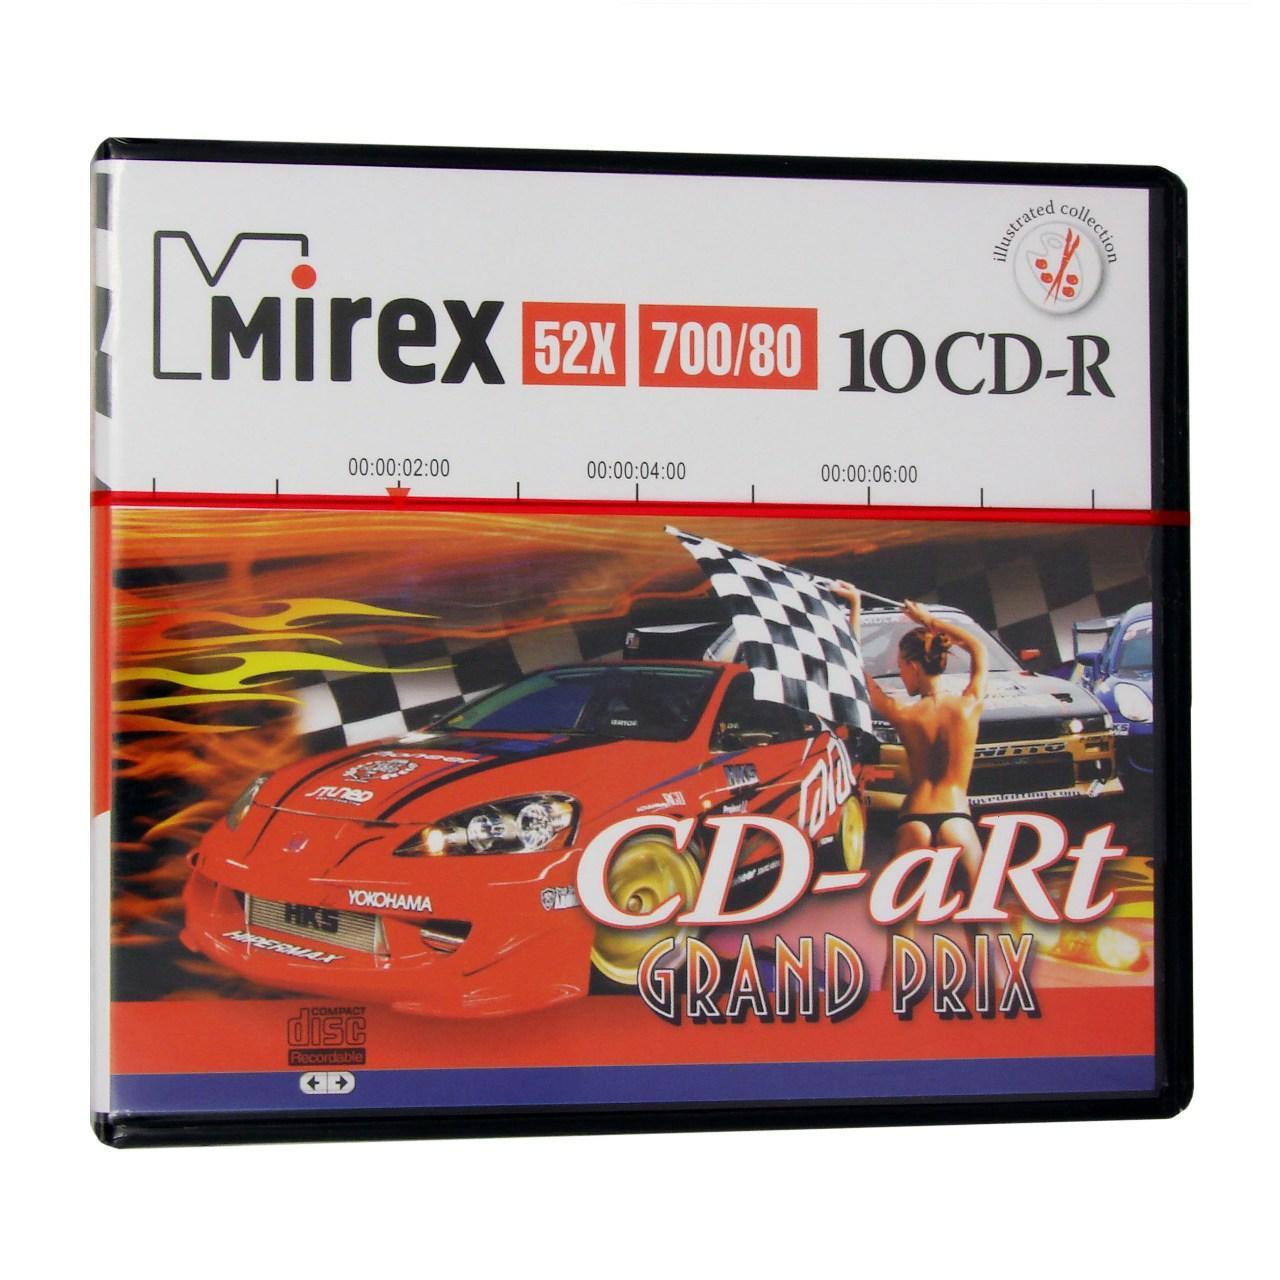 12 Cd R Rw 12x Ritek Excellent Bulk 50 Mirex Art Grand Prix 700 52x